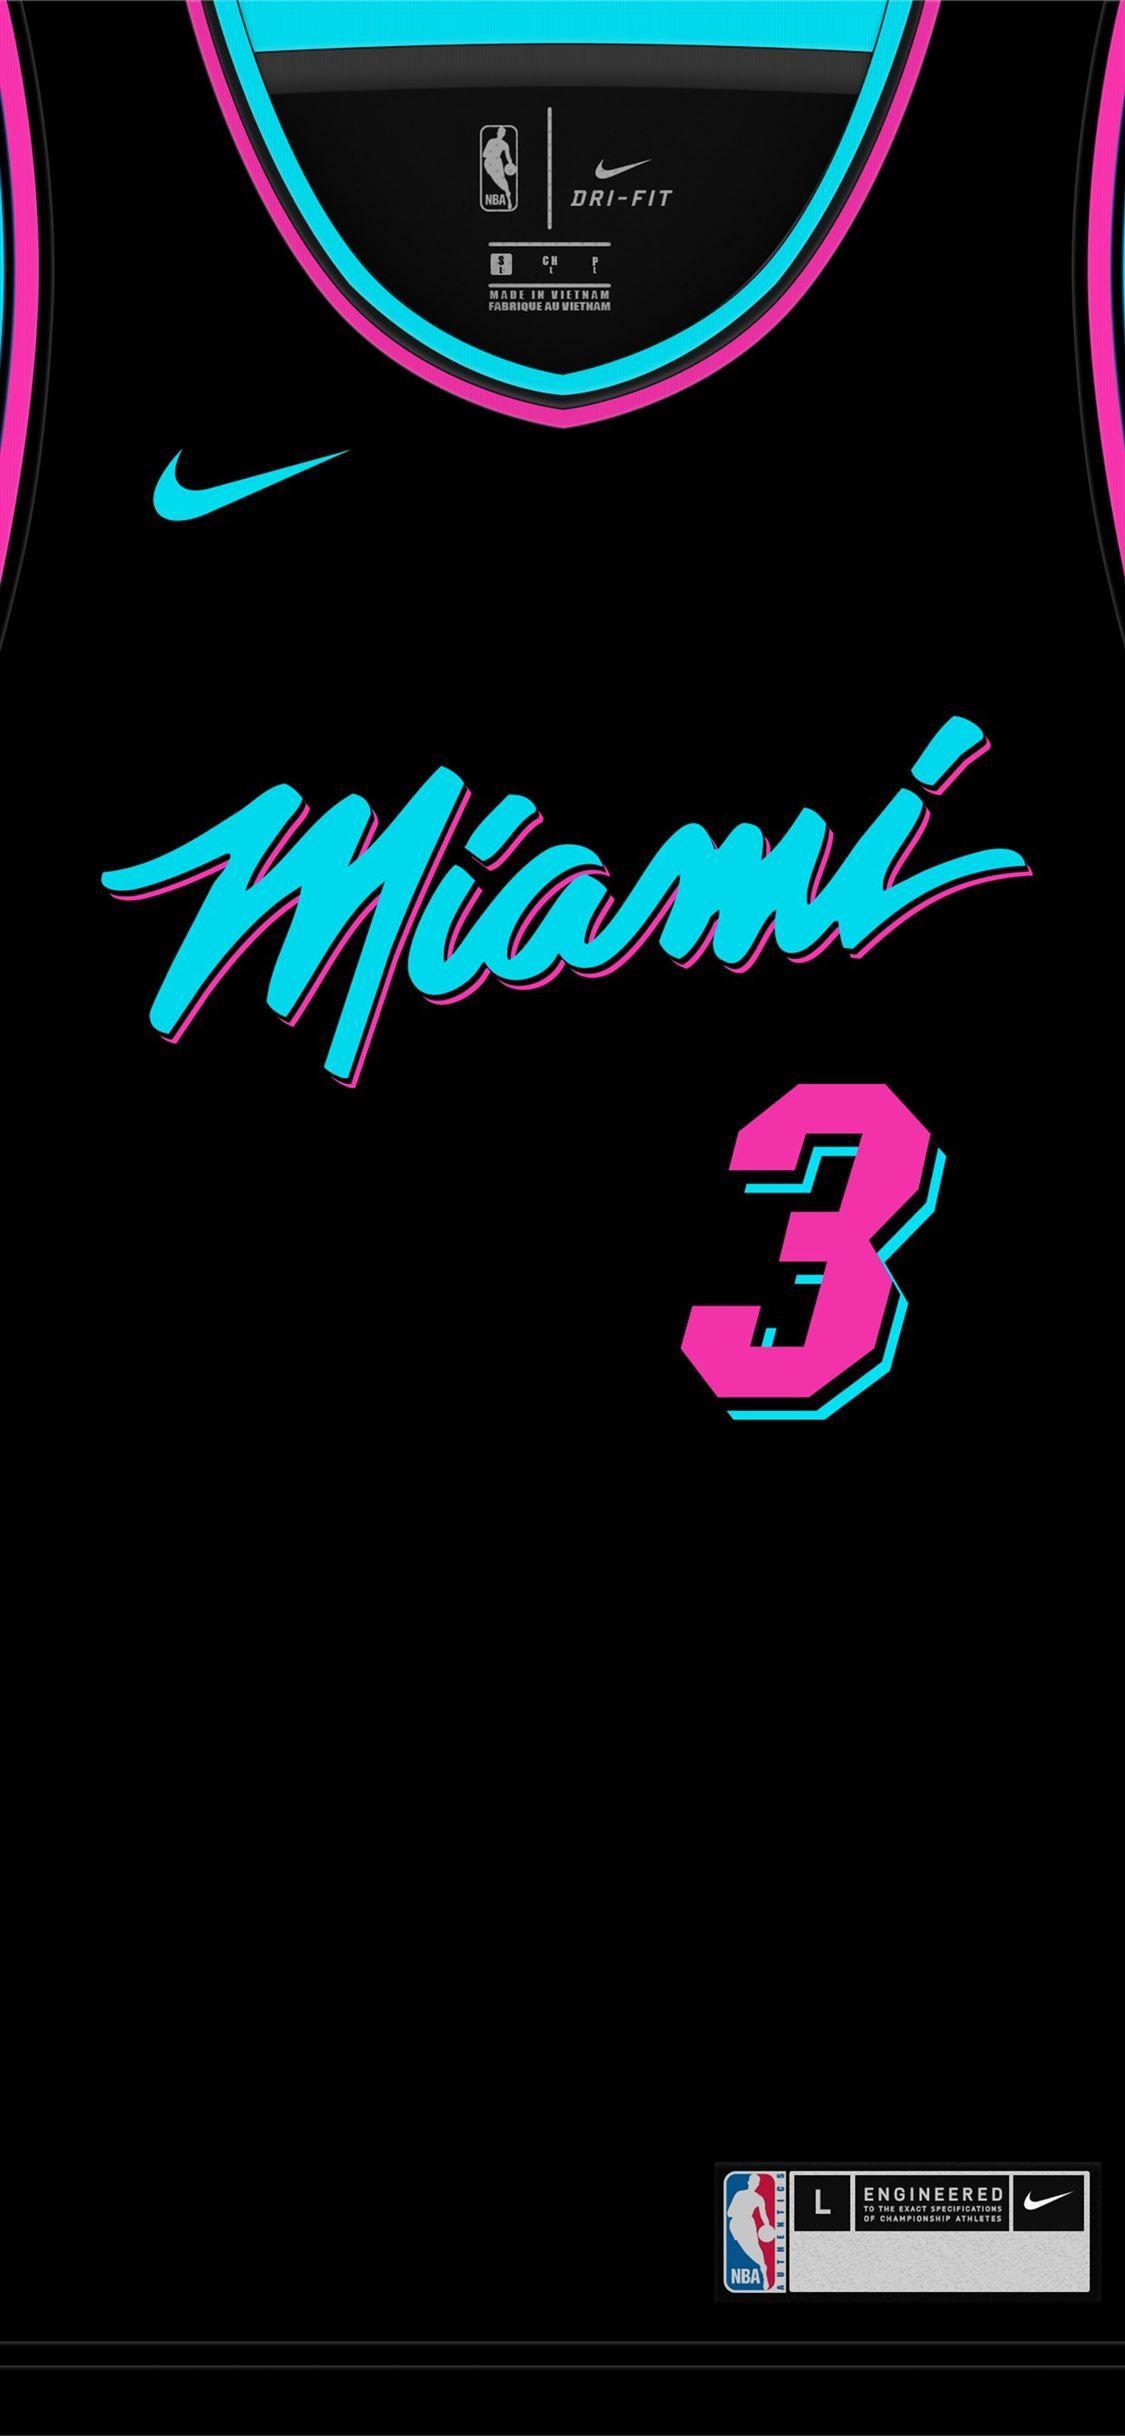 Minimal Miami Vice Jersey Mobile Album On Imgur Dwyanewade Sportcelebrity Basketballcelebrity Unitedstates In 2020 Miami Vice Nba Miami Heat Dwyane Wade Wallpaper